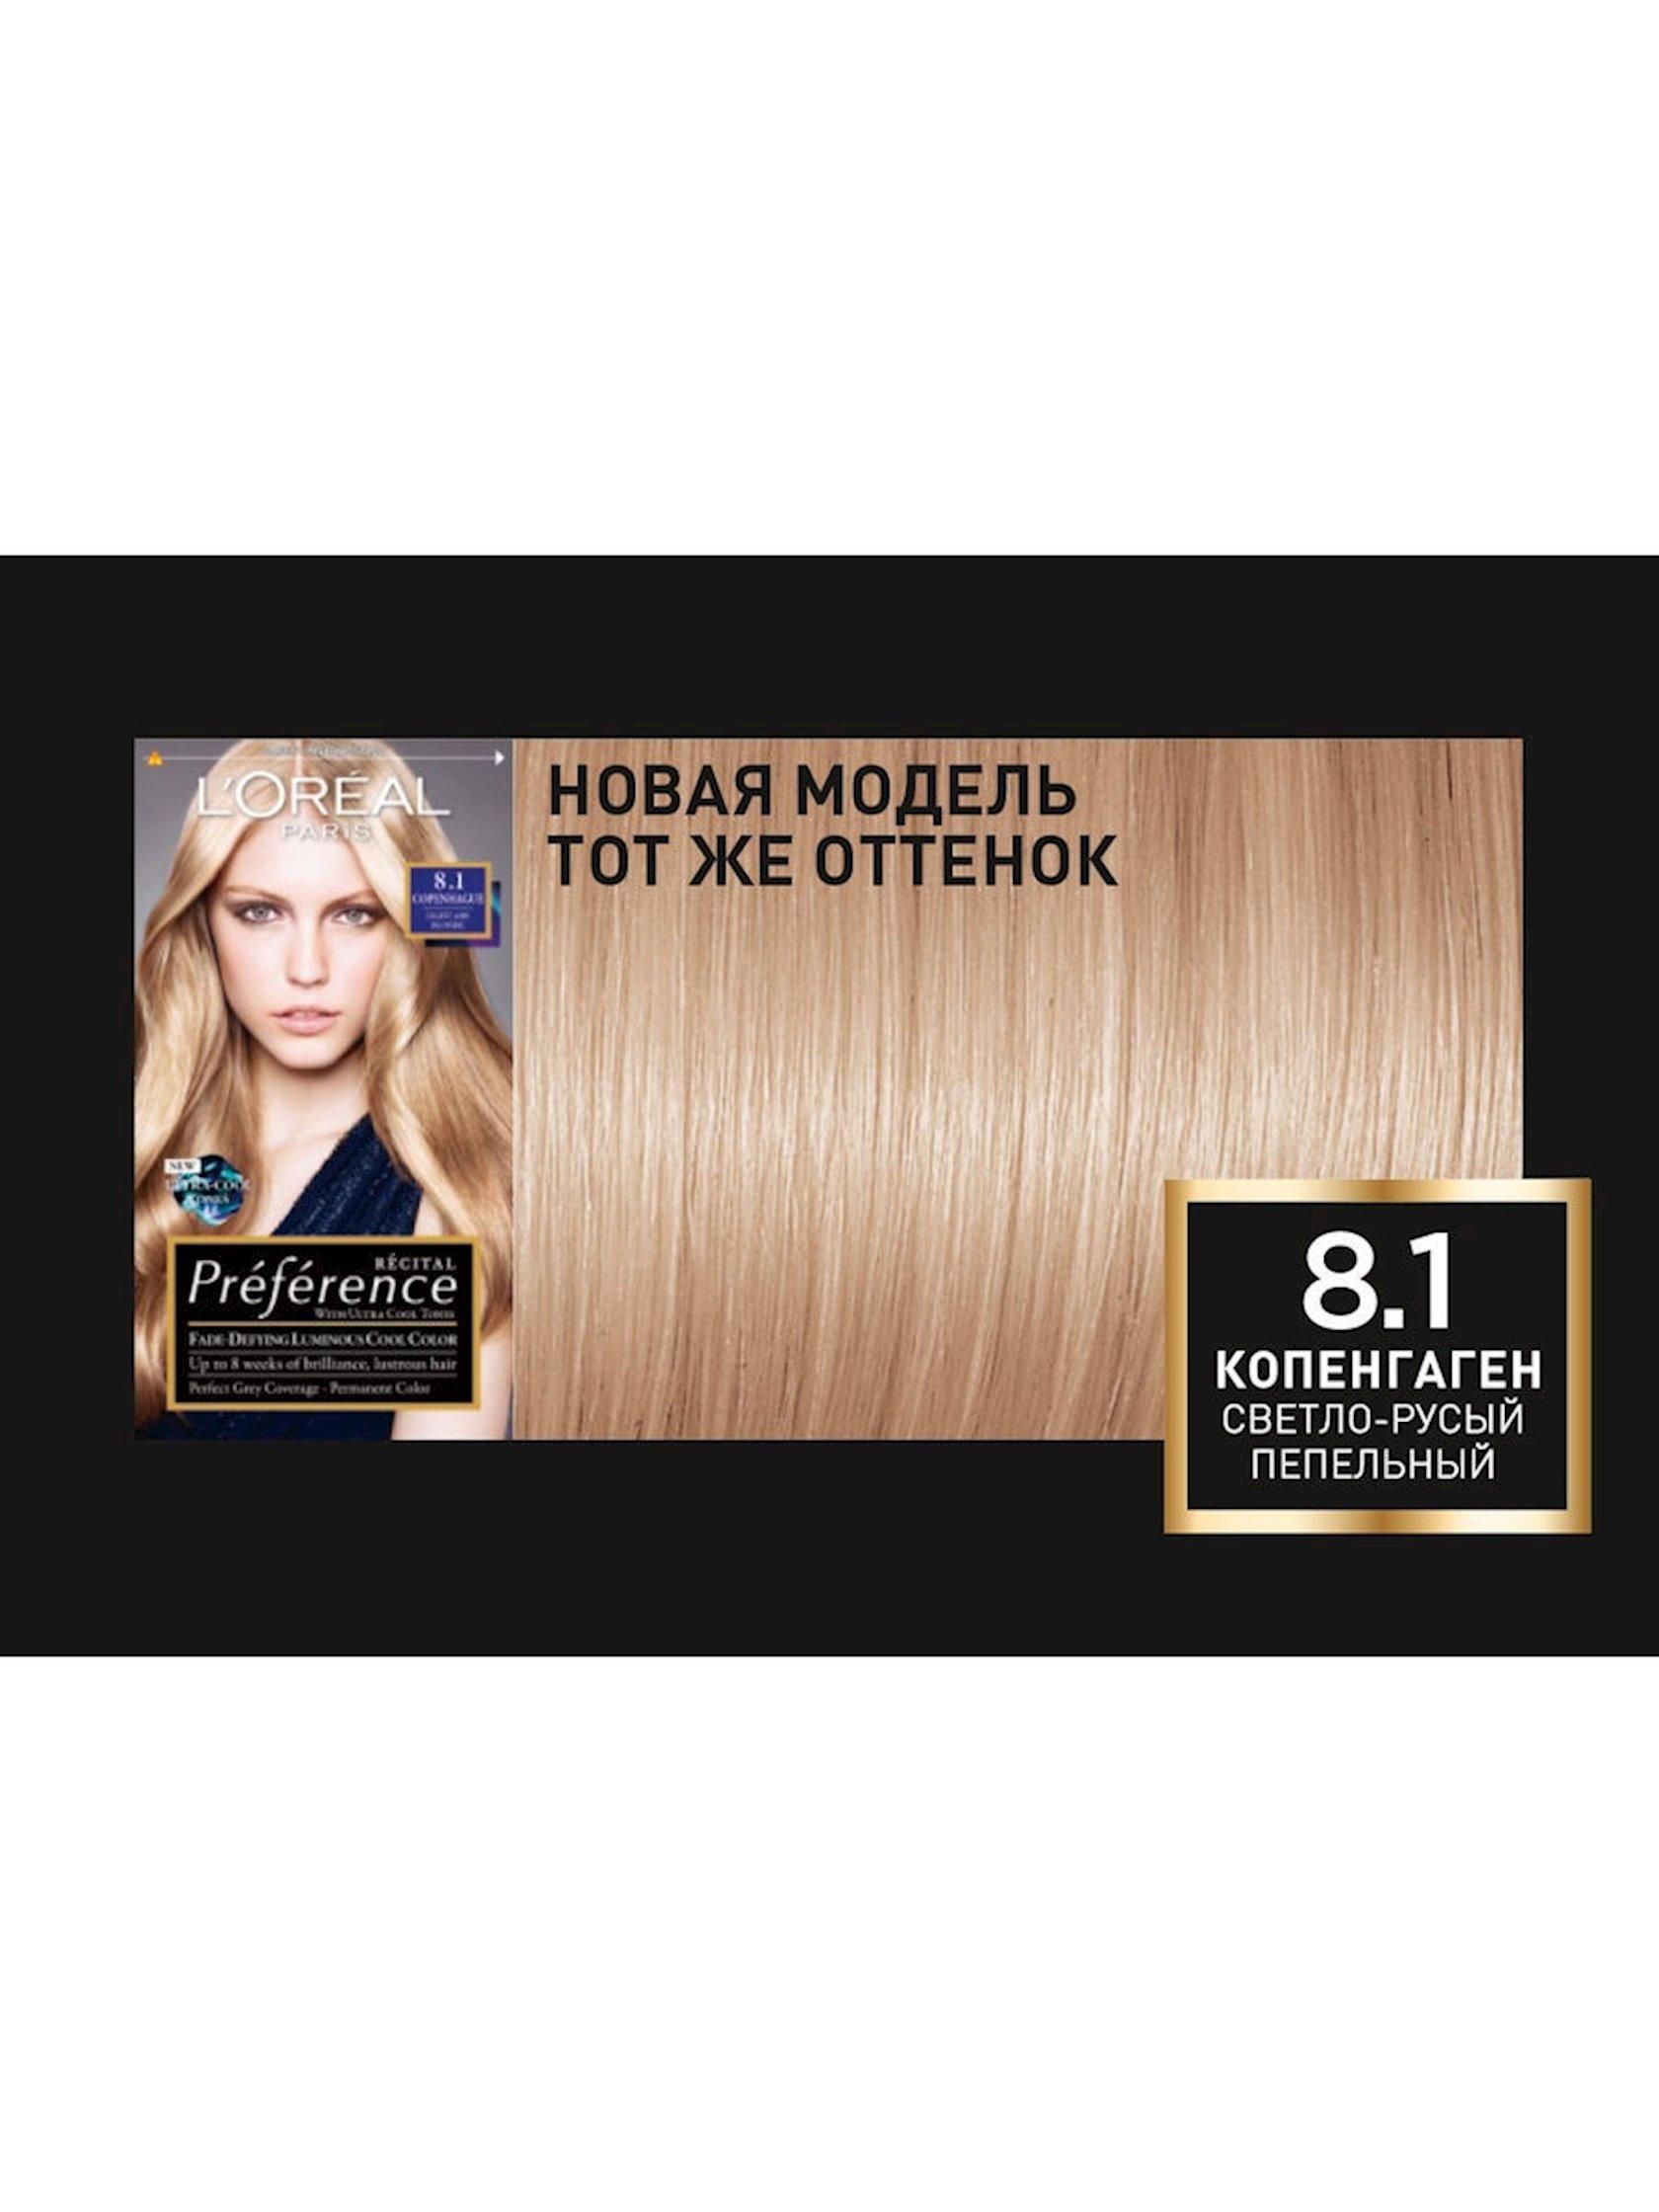 Saç üçün qalıcı krem-boya L'Oreal Paris Preference 8.1 Kopenhagen Açıq sarışın kül